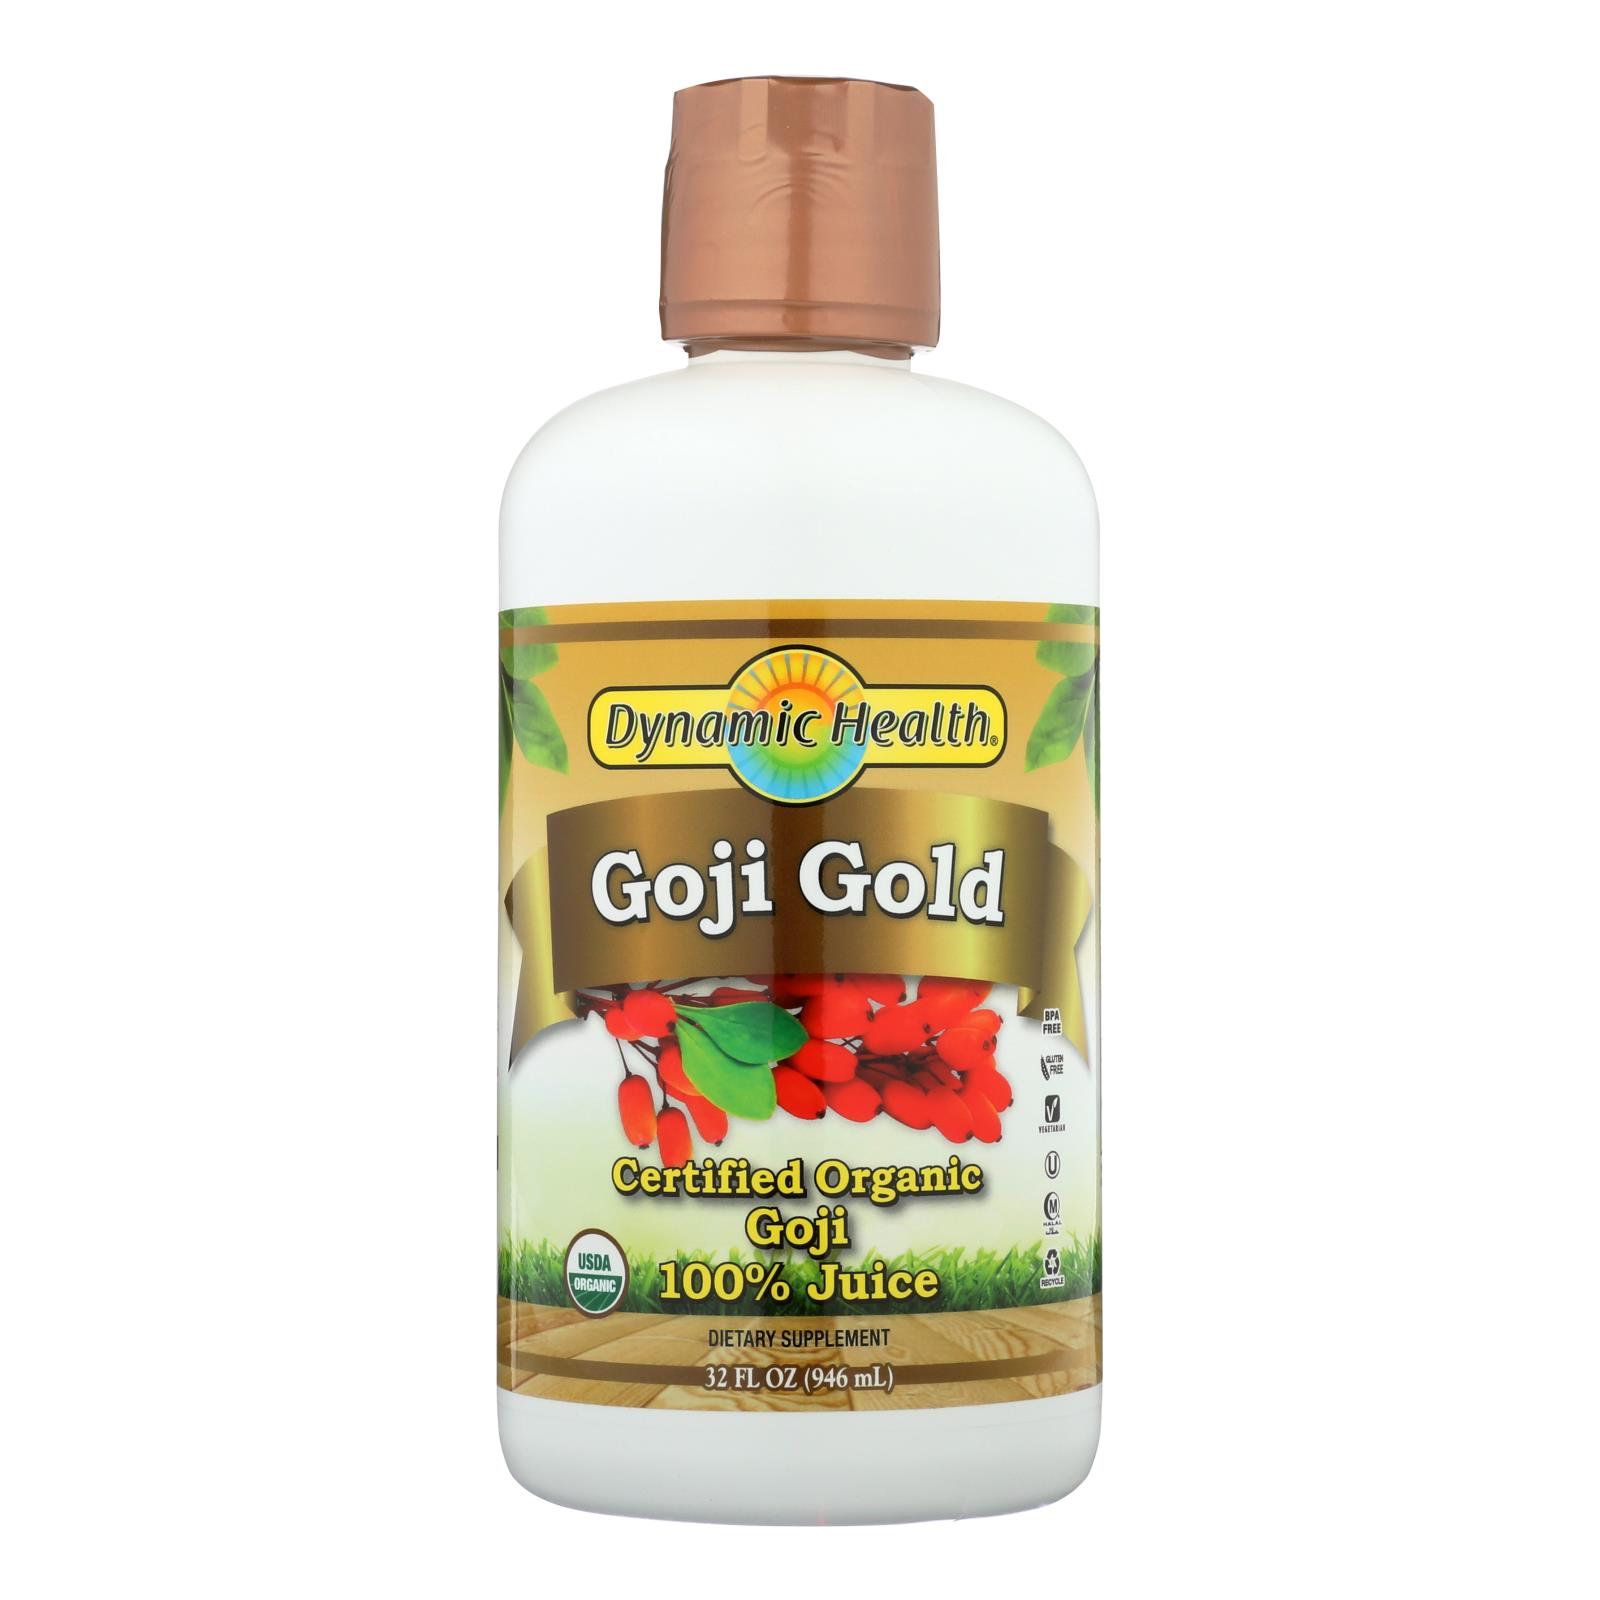 Dynamic Health Organic Certified Goji Berry Gold Juice - 32 fl oz